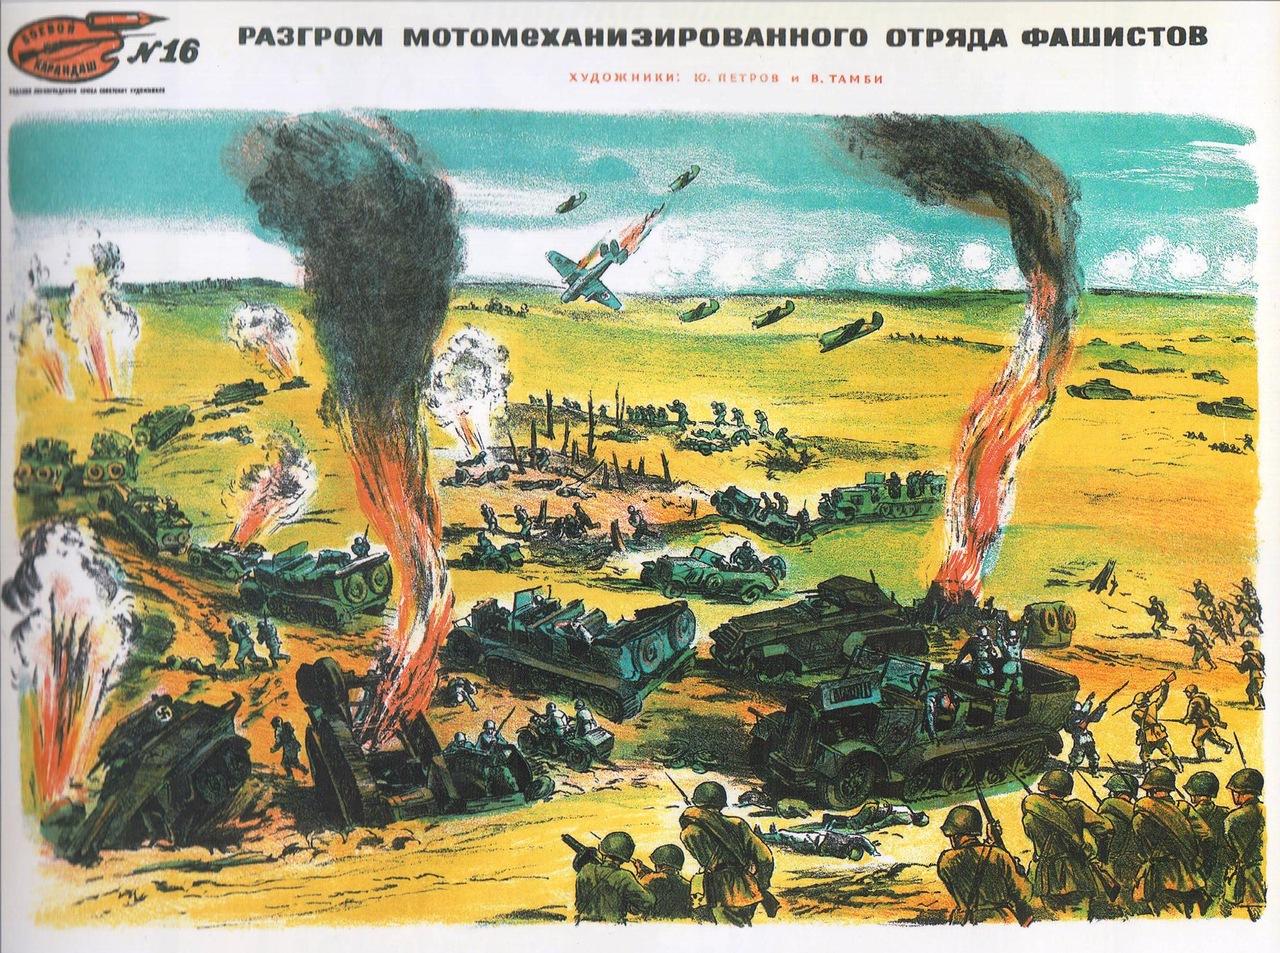 http://propagandahistory.ru/pics/2014/01/1390139360_e8d5.jpg height=595